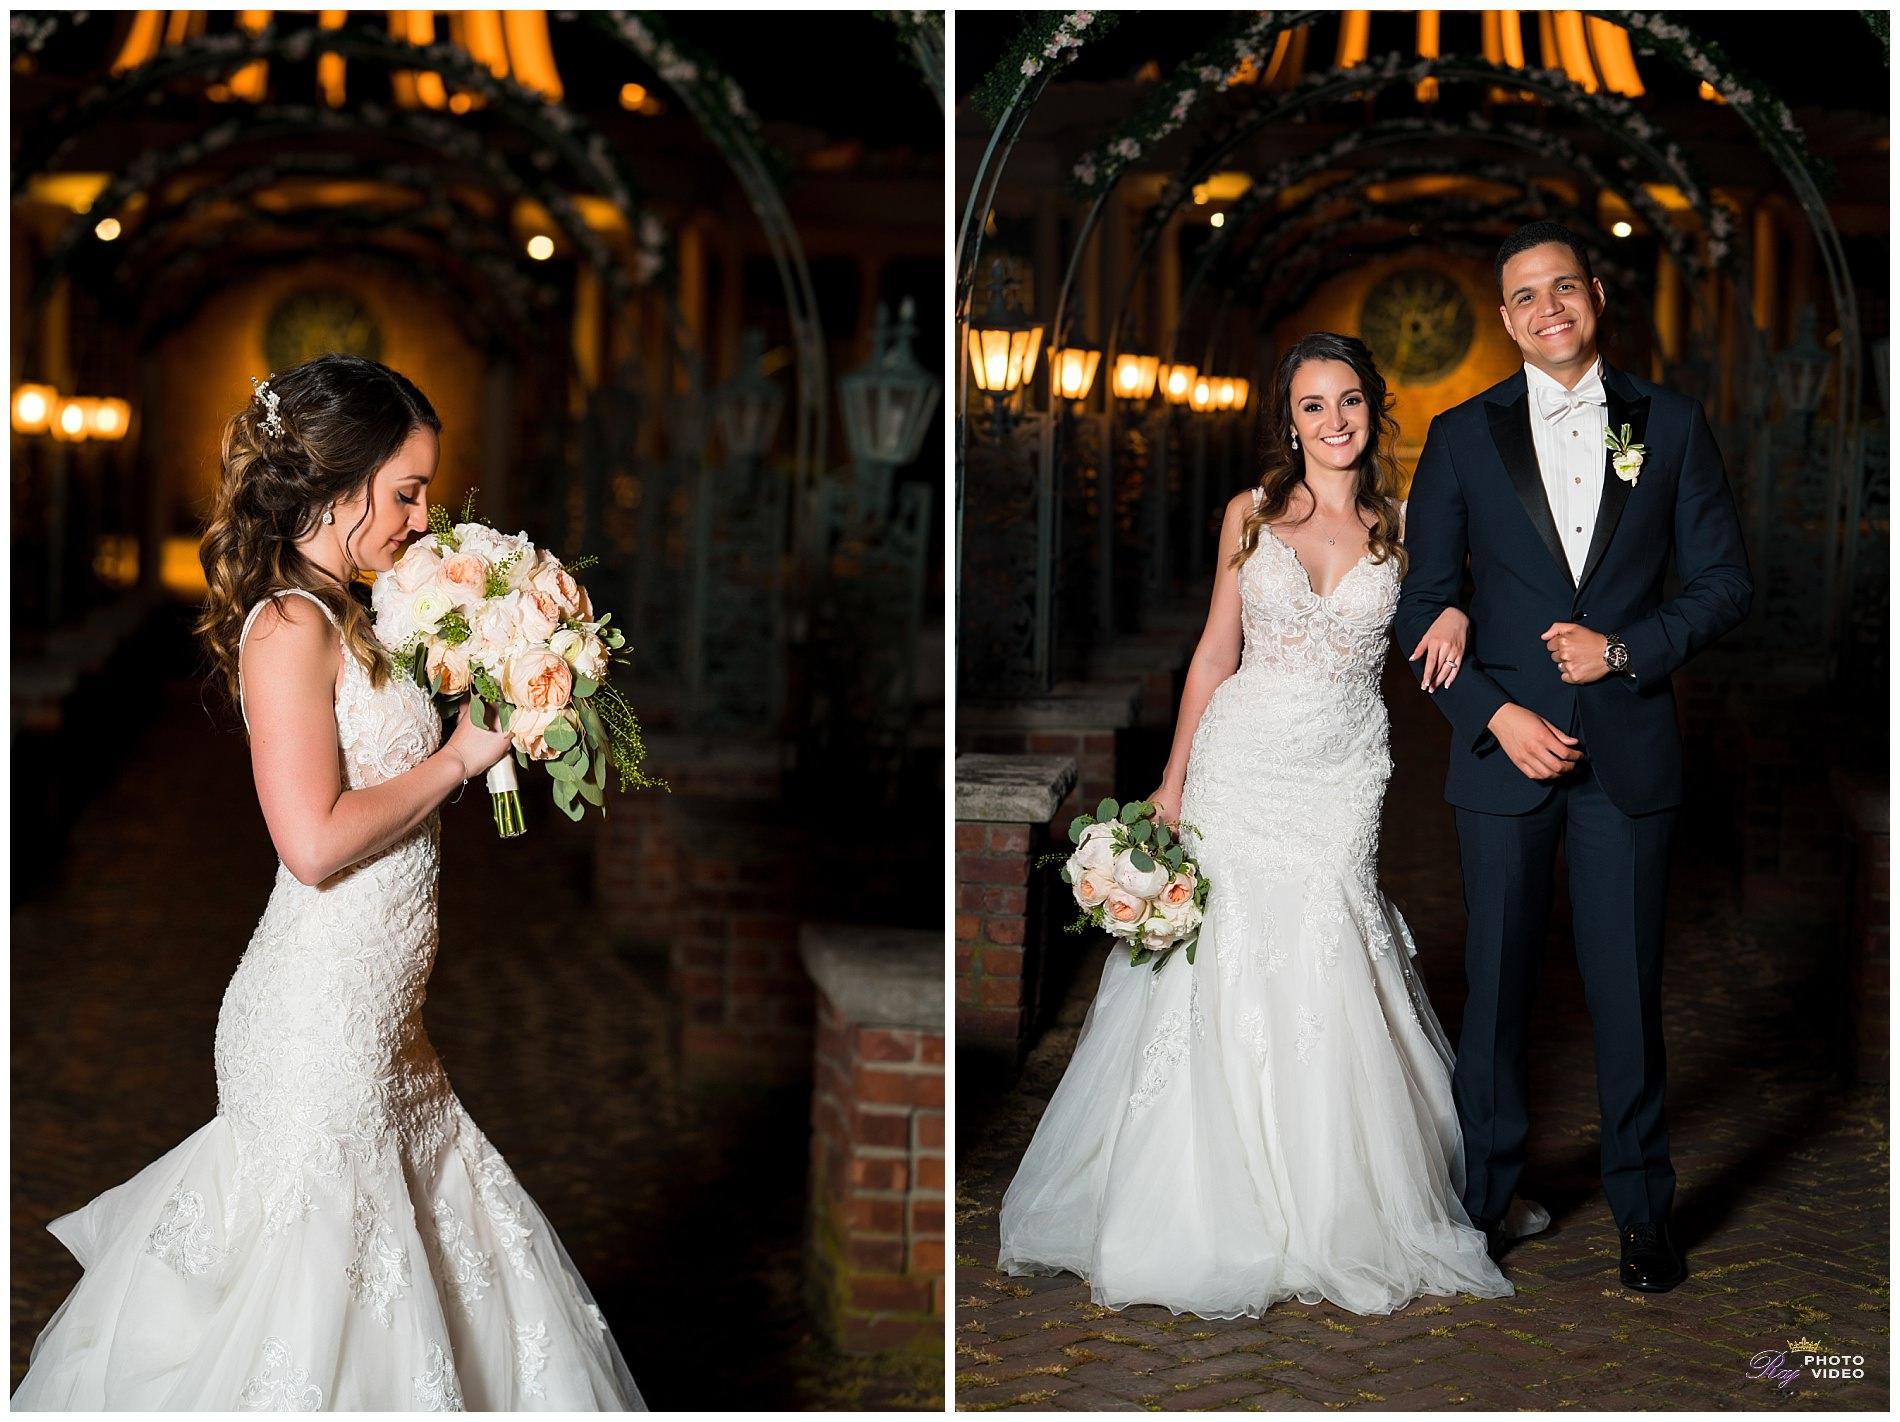 The-Manor-West-Orange-NJ-Wedding-Reception-Yanet-Jose-21.jpg